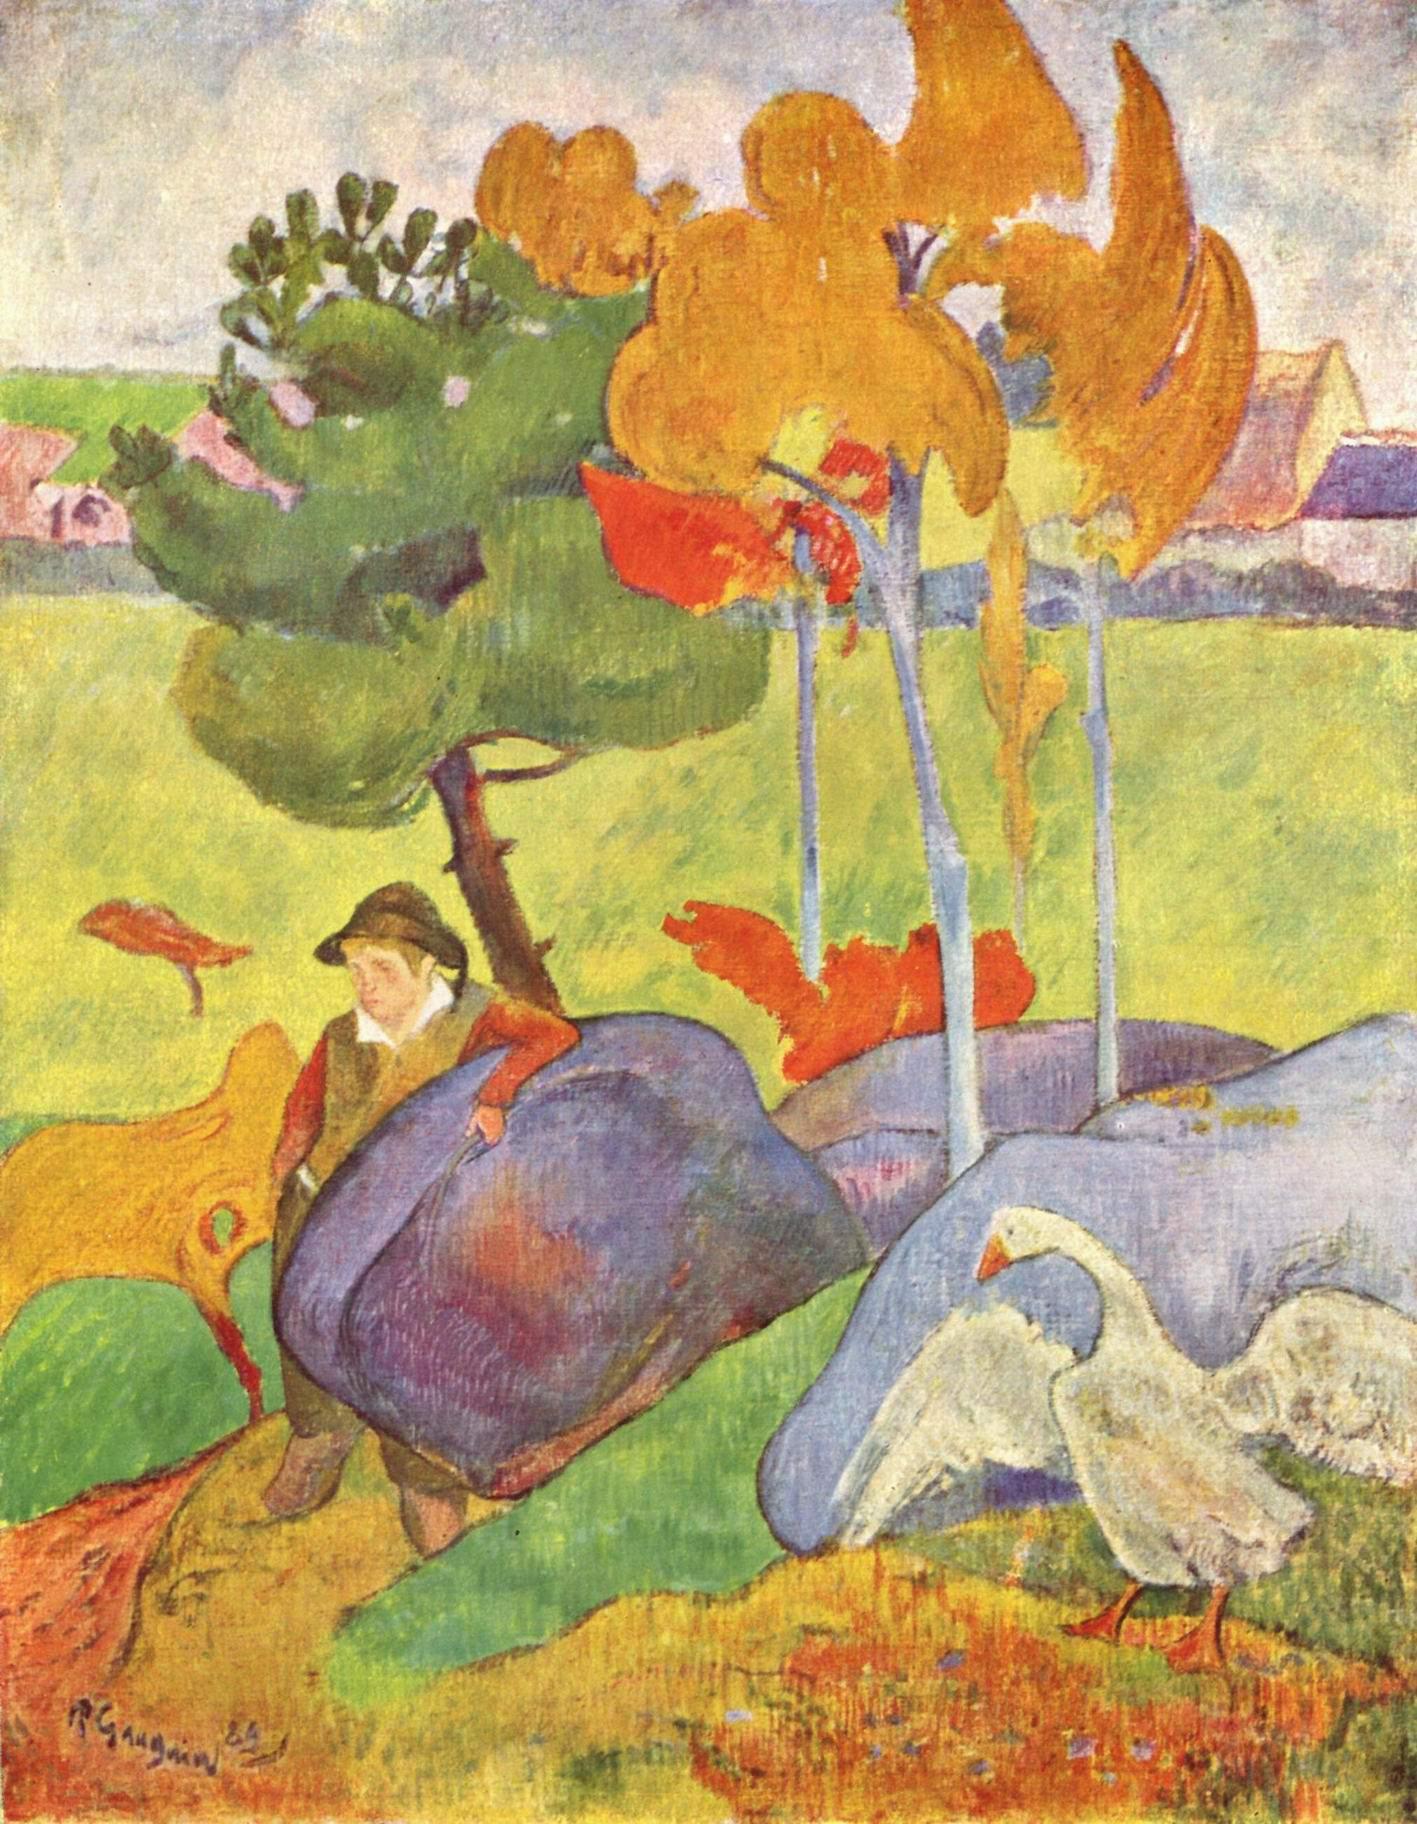 Бретонец, пасущий гусей, Поль Гоген